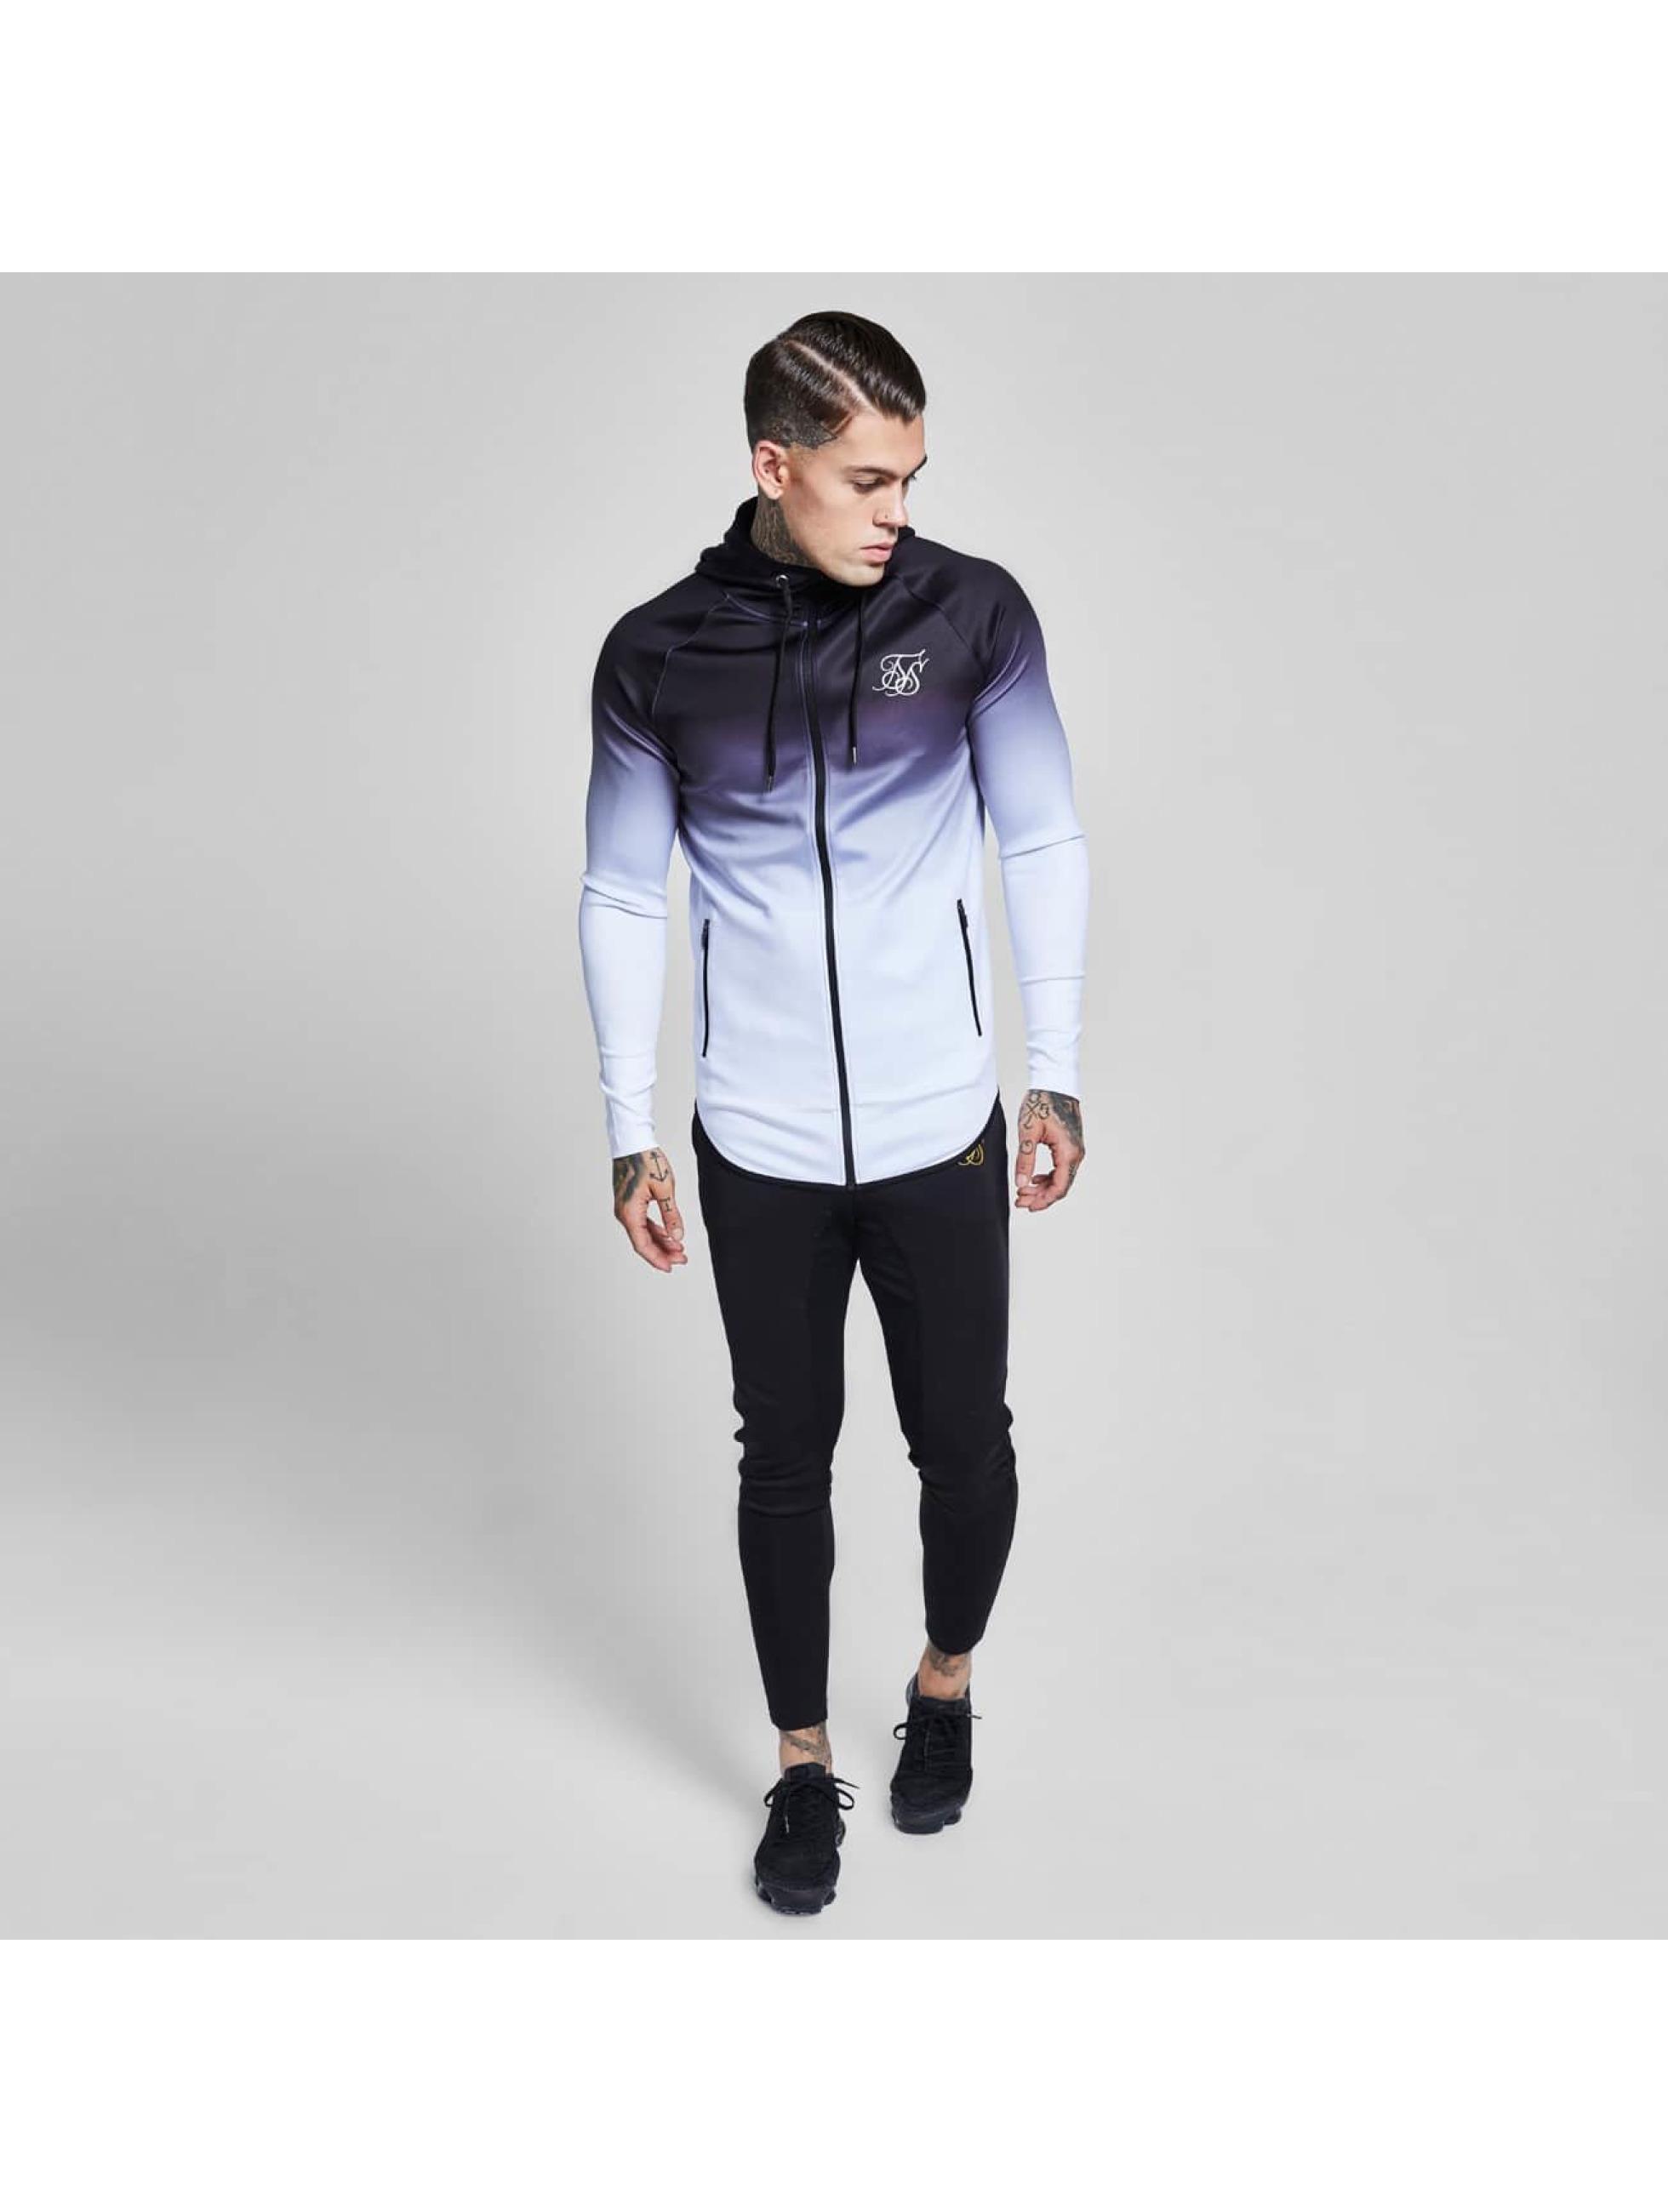 Sik Silk Lightweight Jacket Athlete Through black